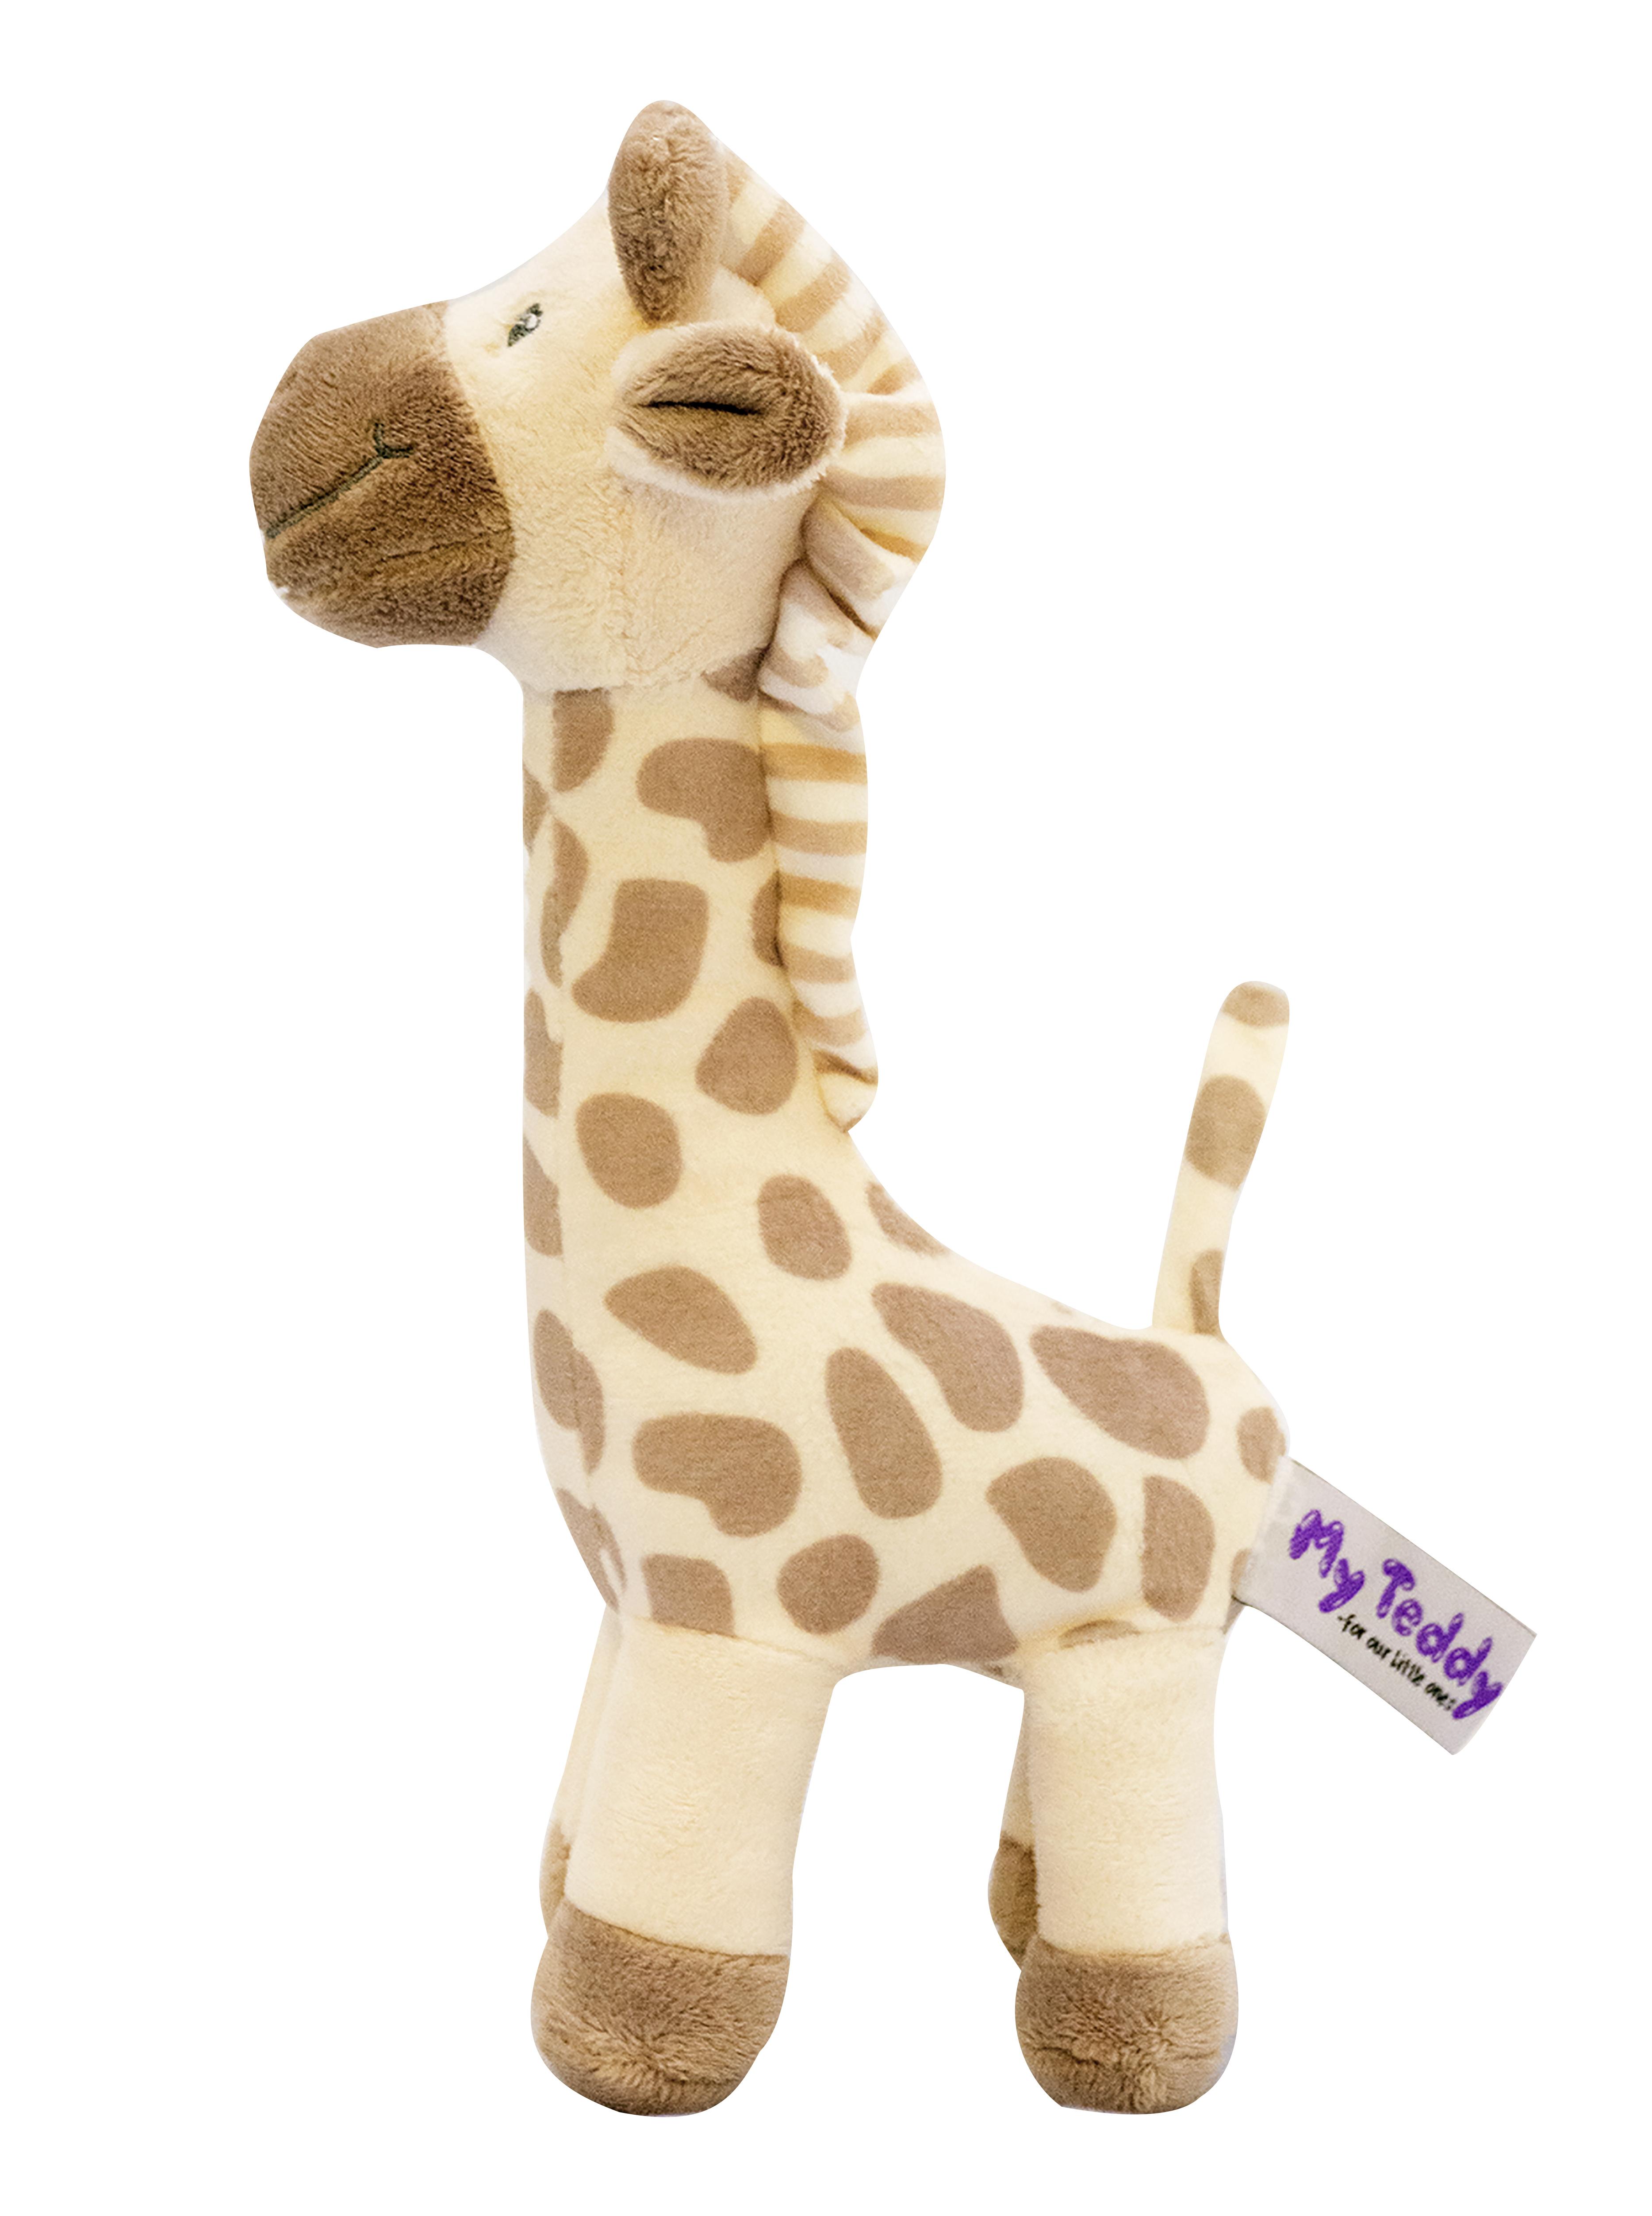 My teddy My teddy - giraf rangle, 6 stk. på lager på pixizoo